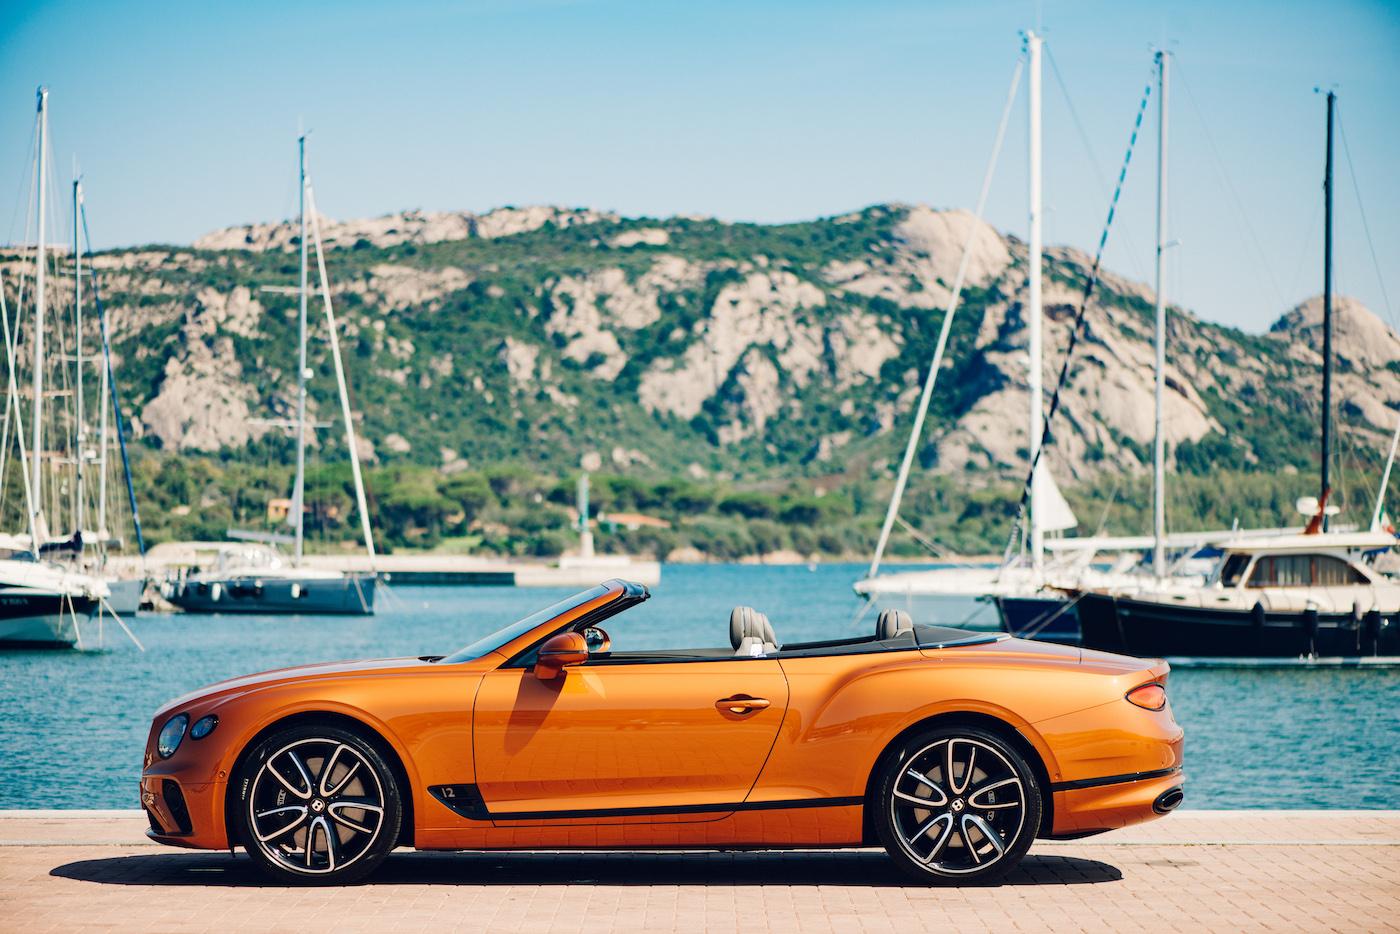 Mit Bentley in Porto Cervo: Die Bentley Summer Tour 2019 5